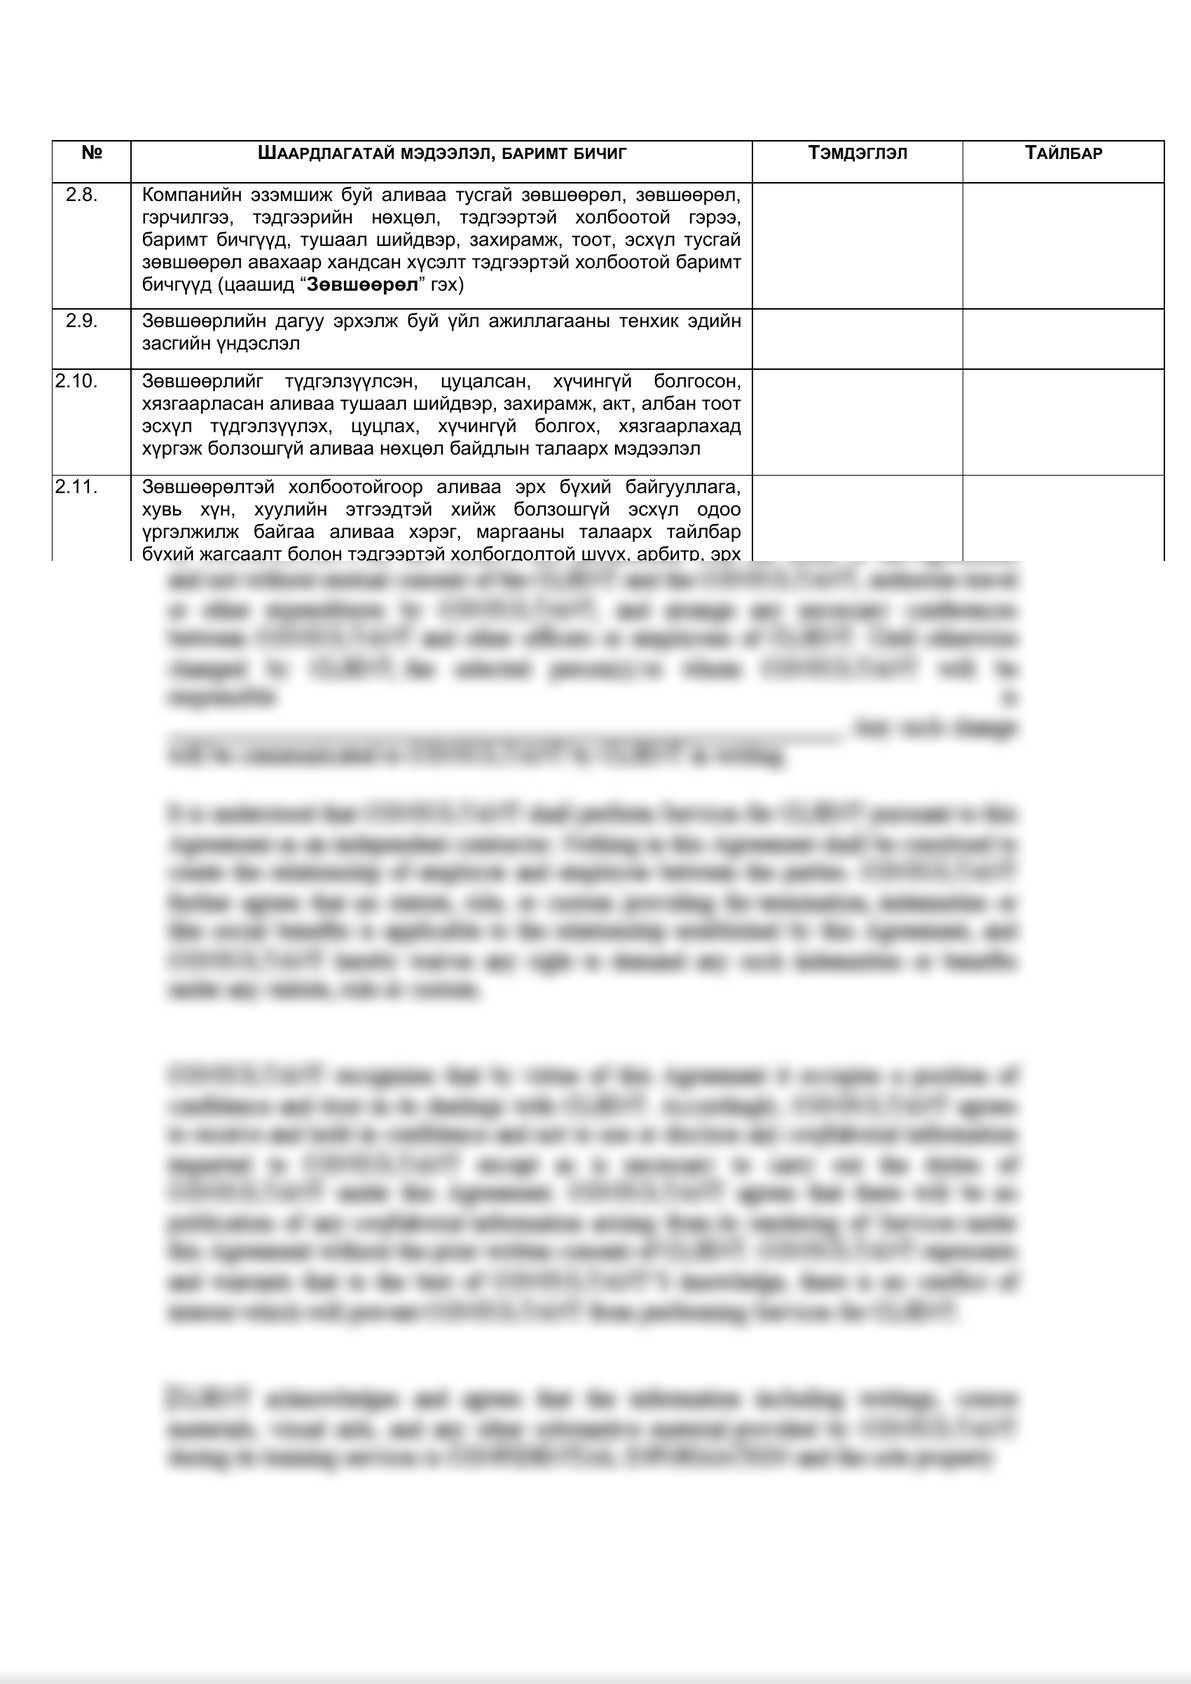 Legal due diligence checklist (Mongolian legal entities)    -7